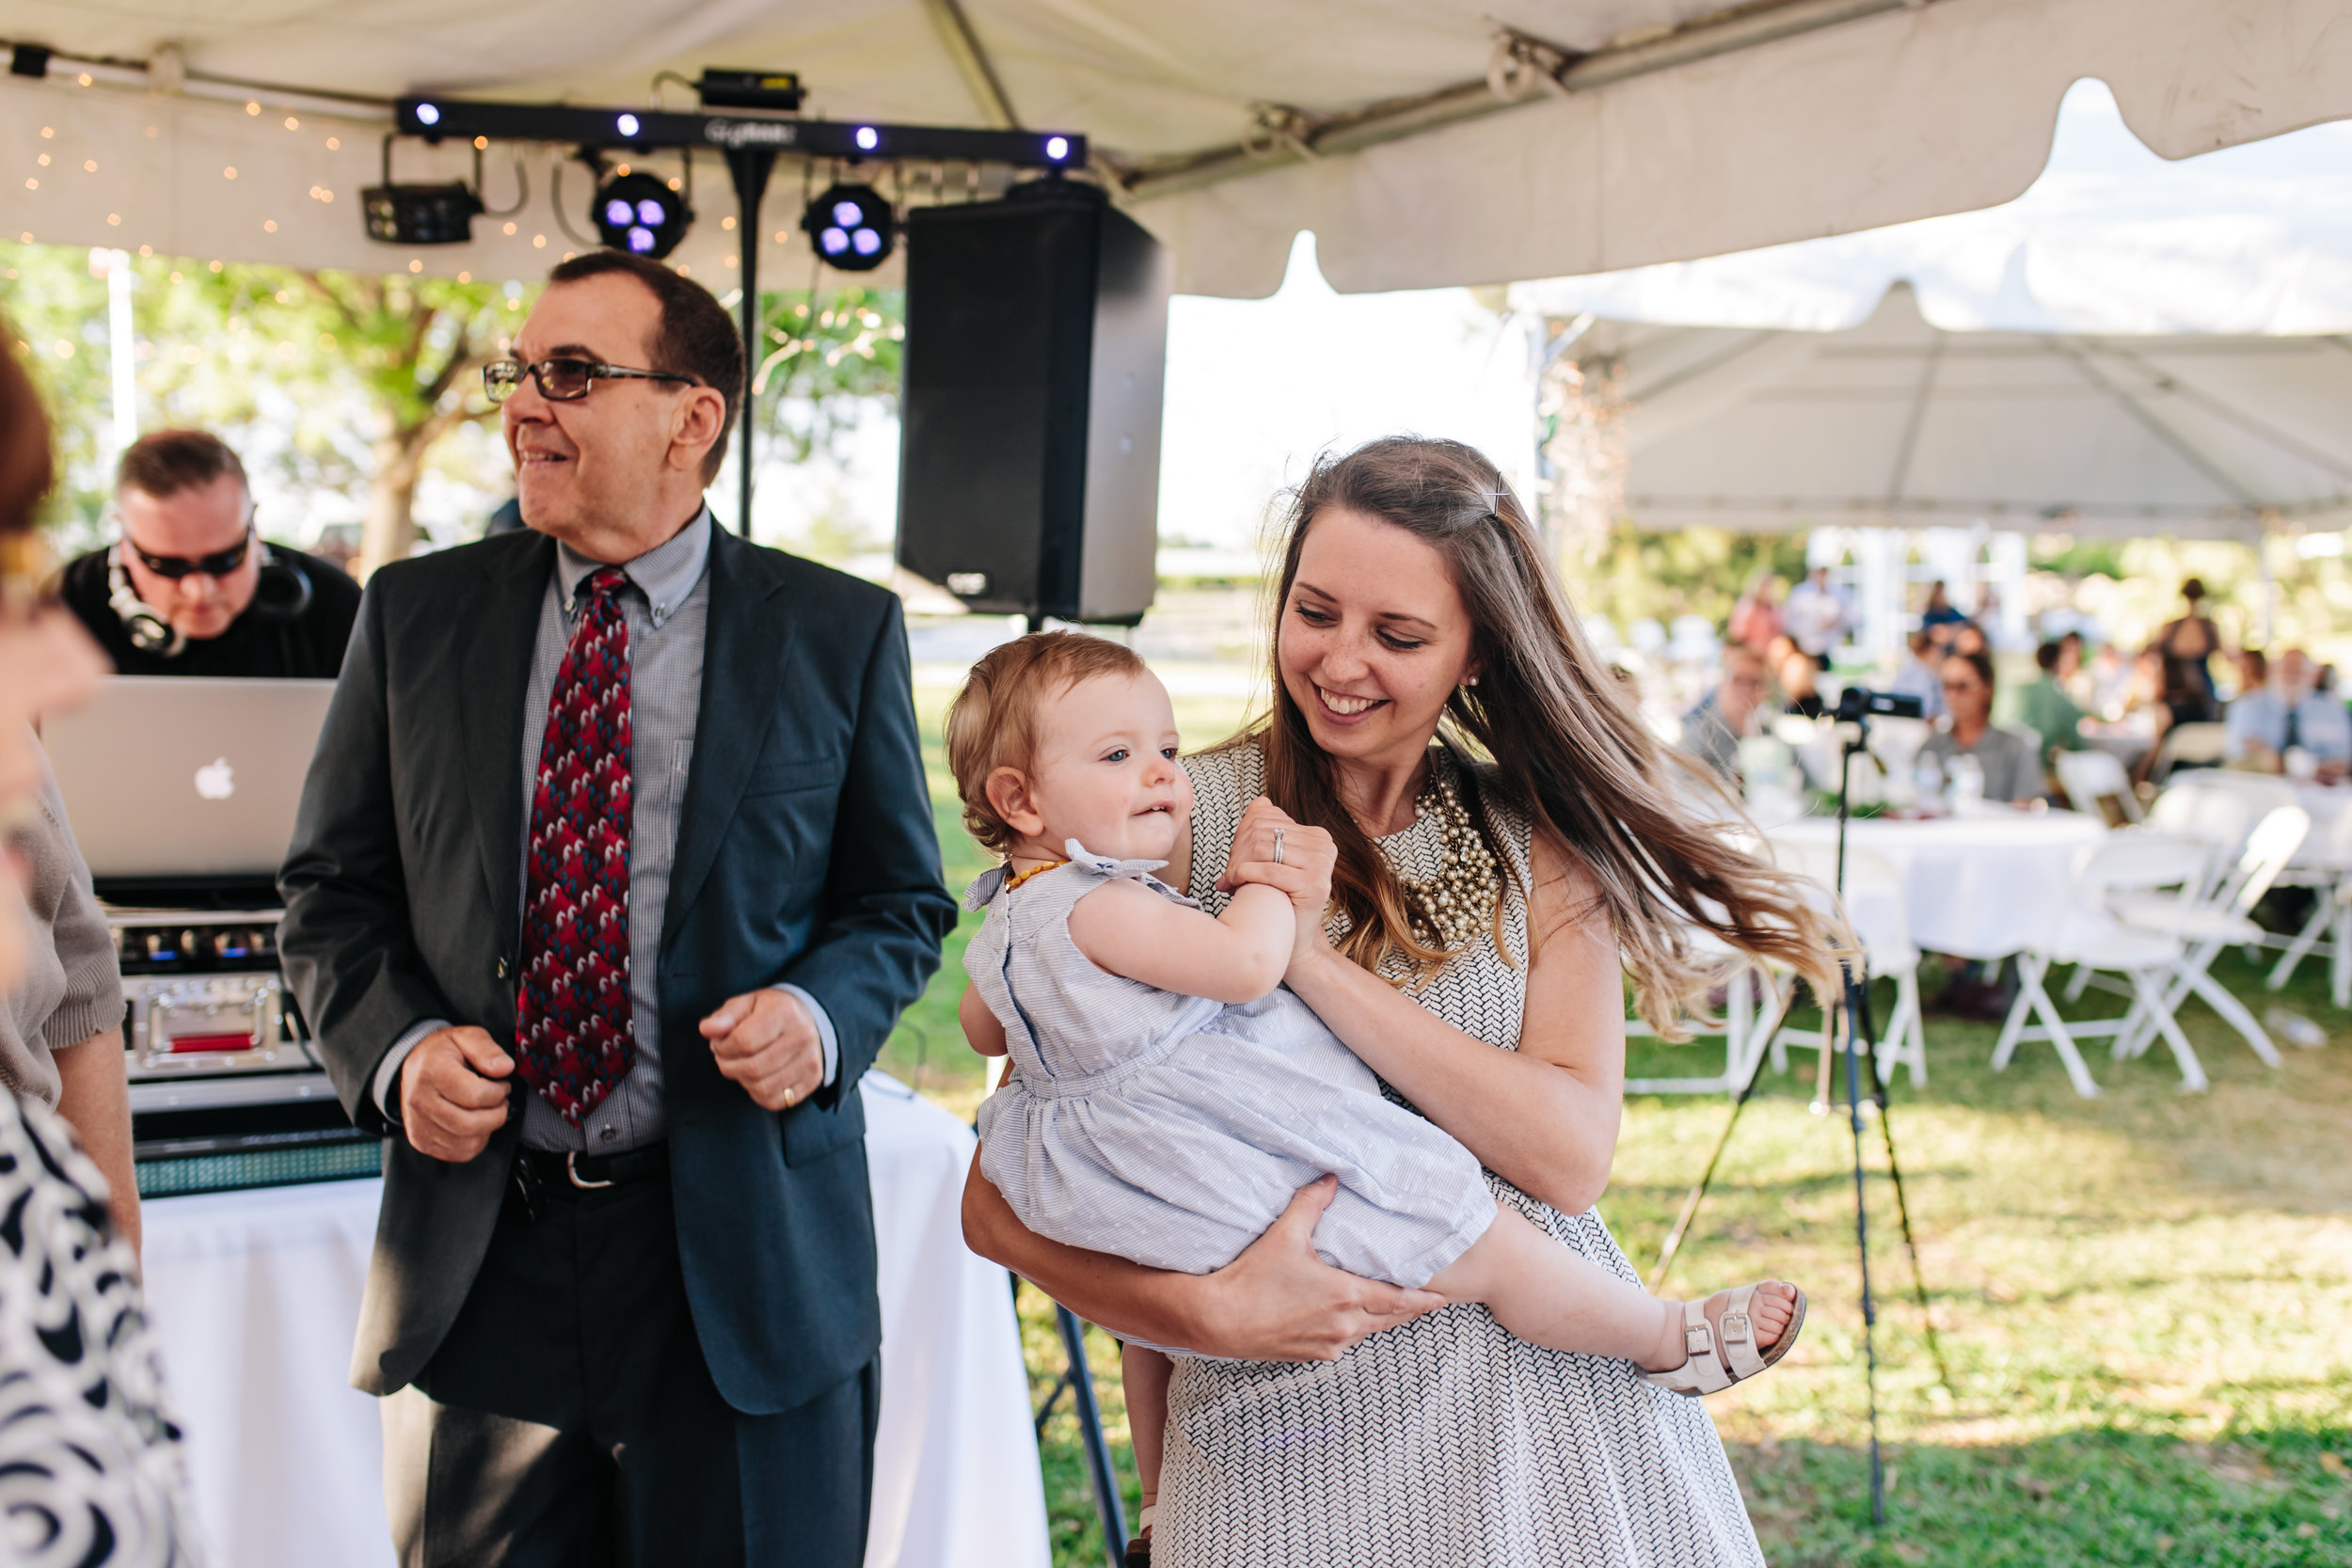 2018.03.17 Allison and Chuck Wedding Waelti Melbourne (686 of 569).jpg